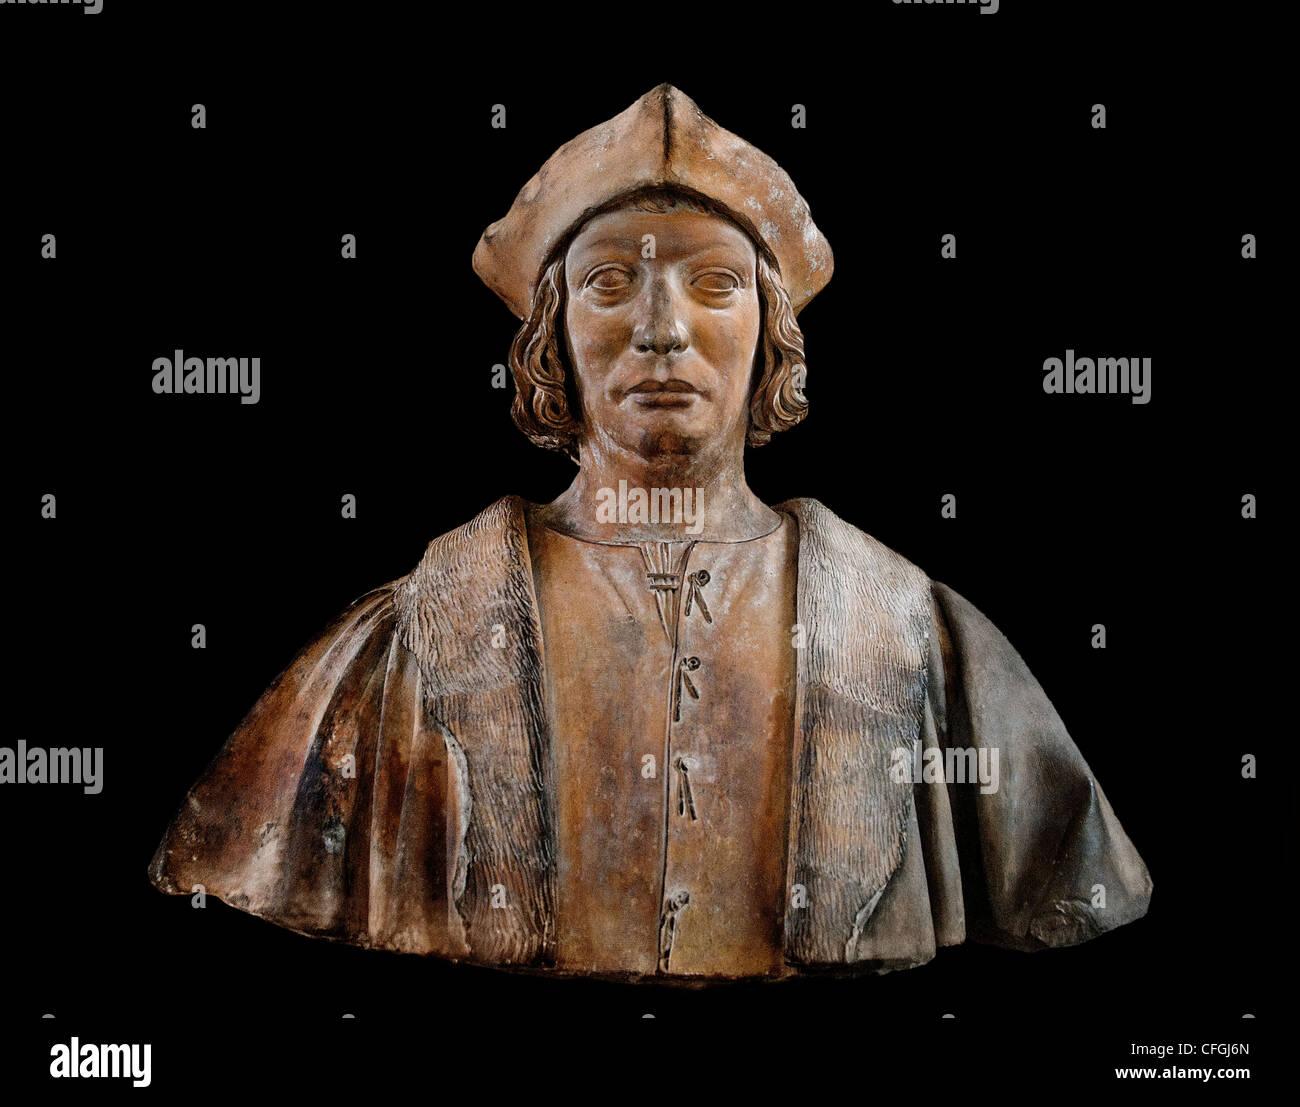 Antoine Duprat 1463-1535 cardinal chancellor king Francois I France France French - Stock Image